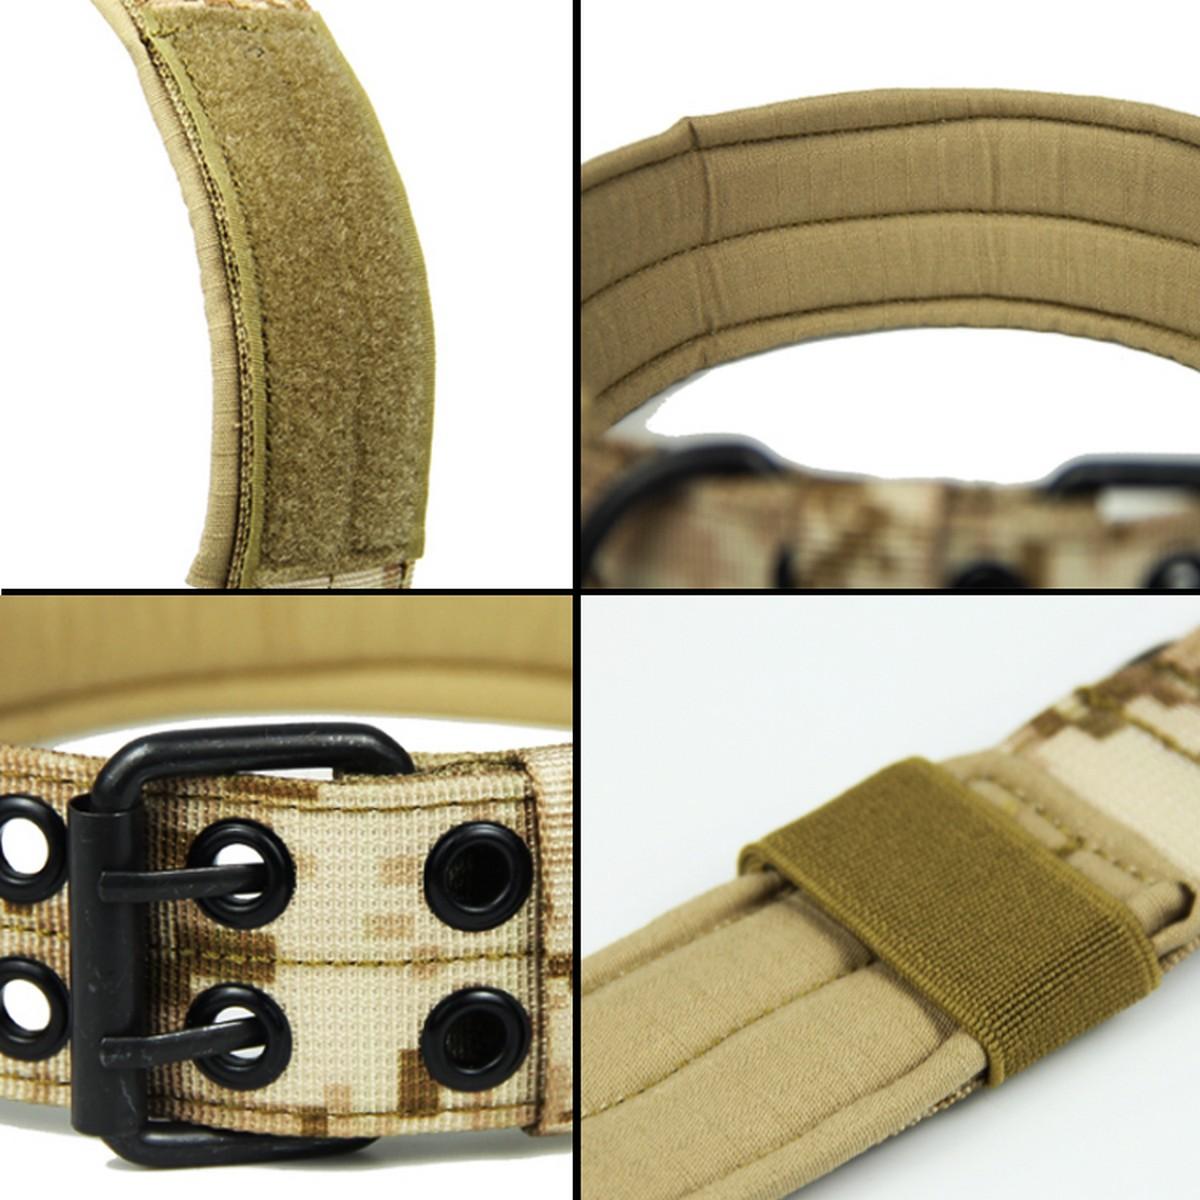 Tactical-Scorpion-Gear-Dog-Collar-Canine-K9-Training-Walking-Military-Nylon thumbnail 13